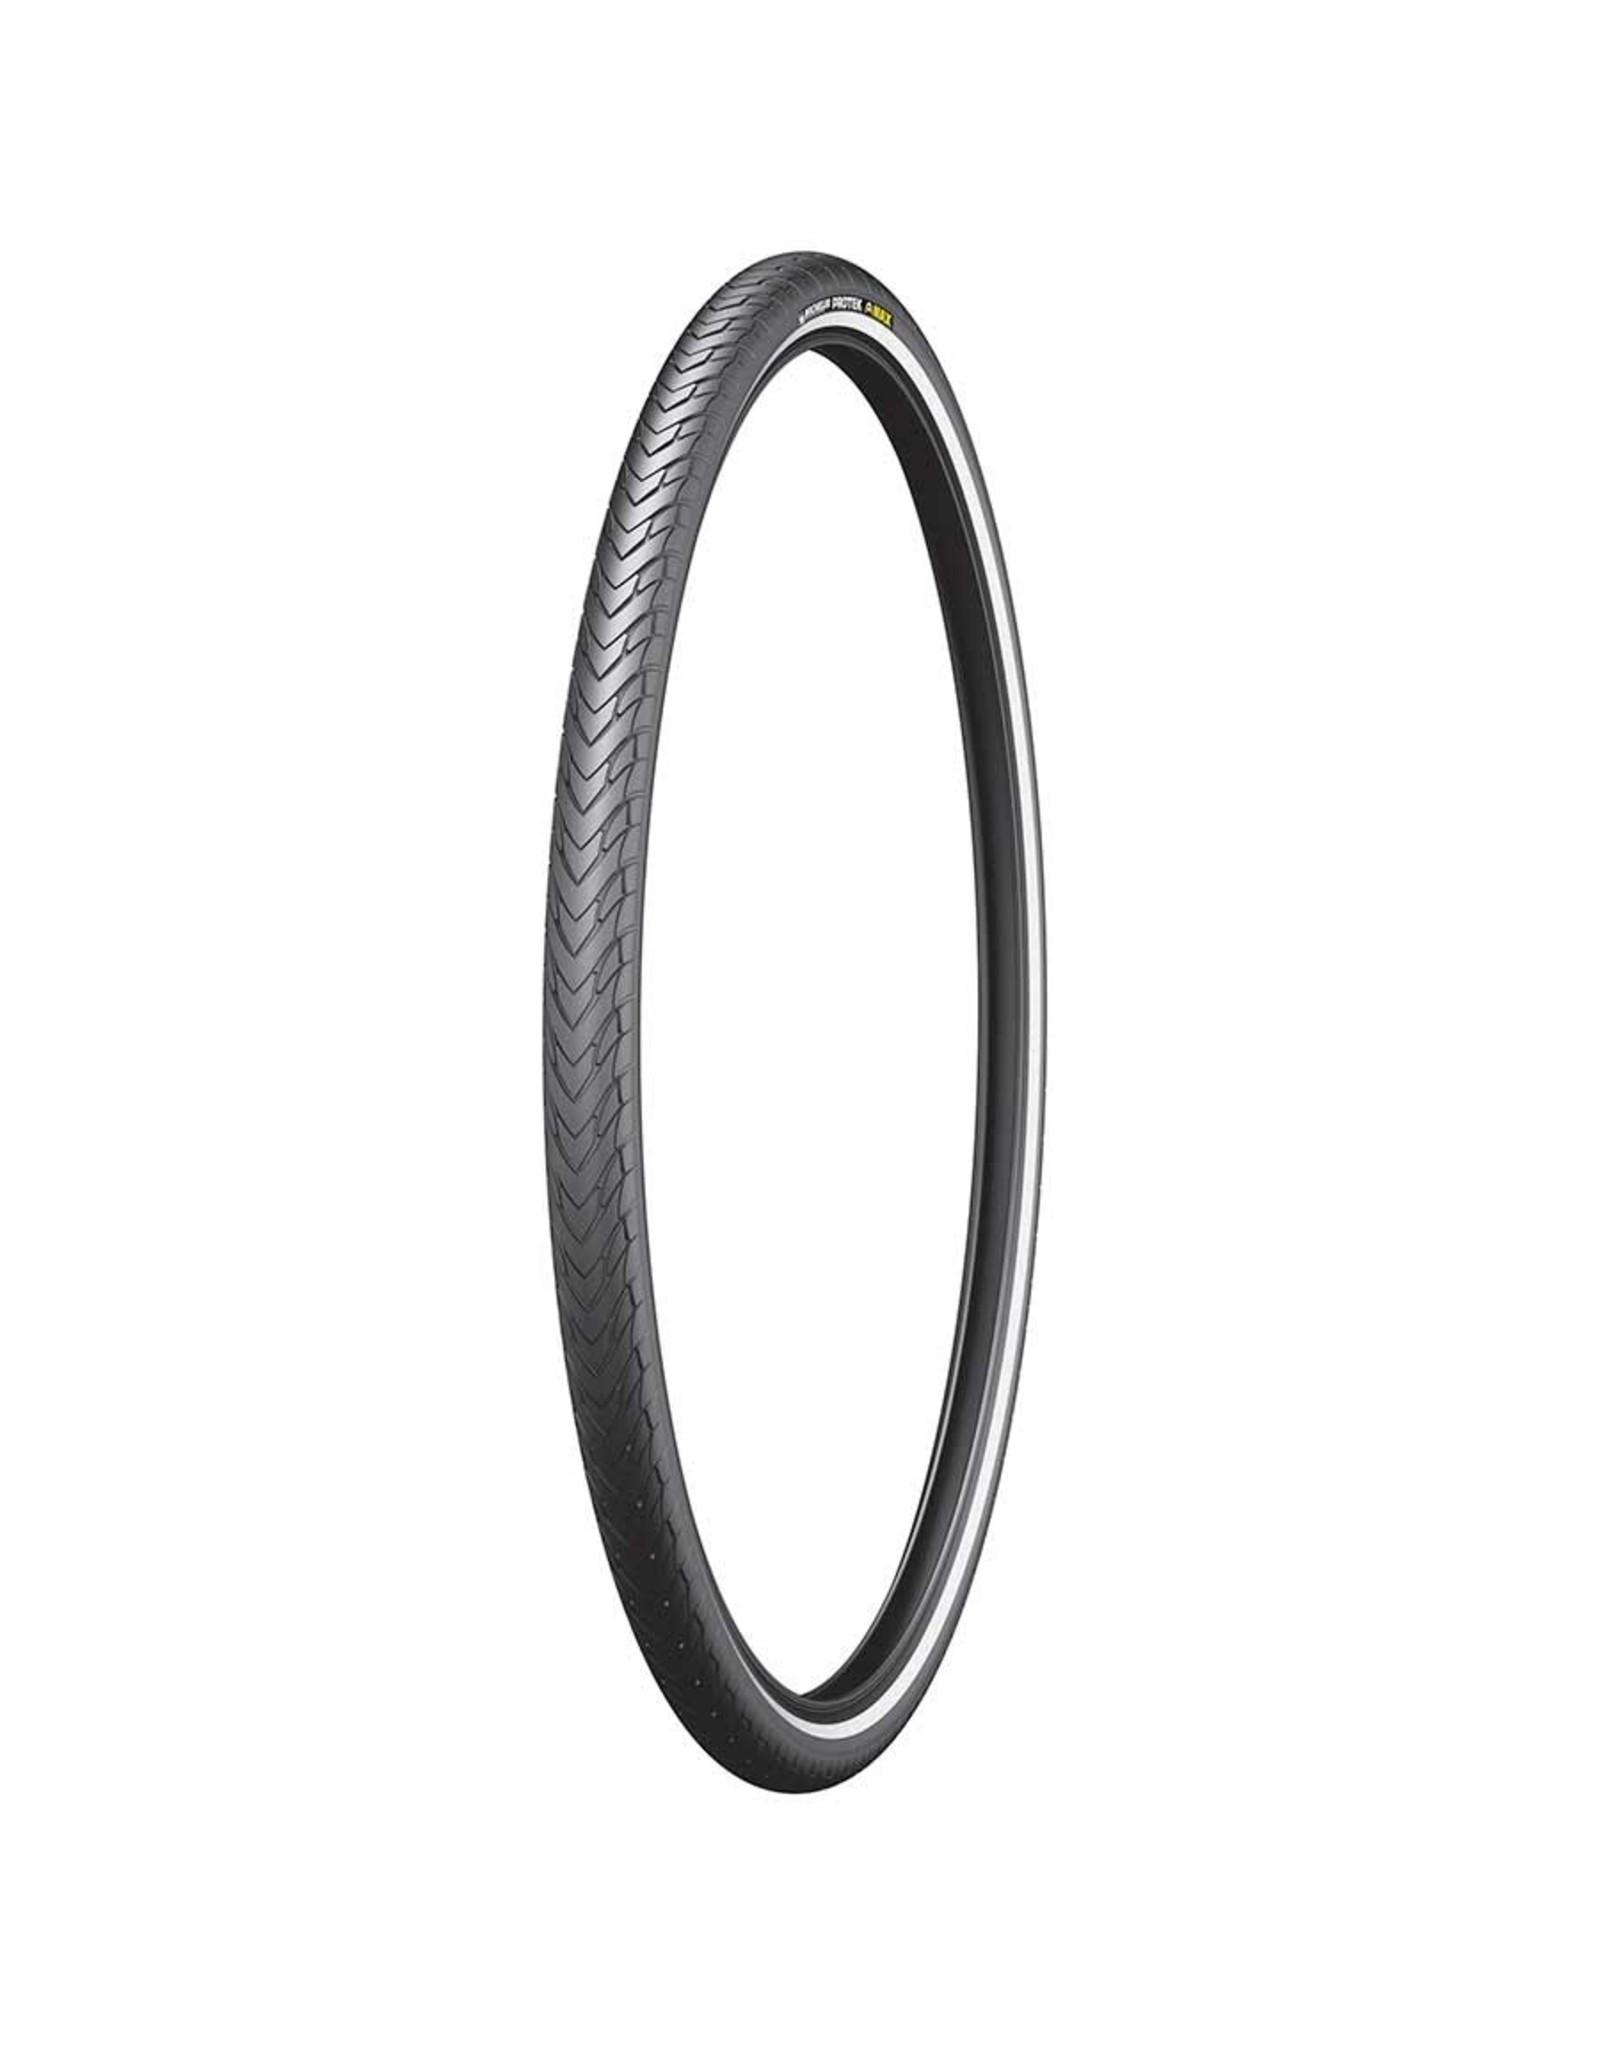 Michelin, Protek Max, Tire, 700x35C, Wire, Clincher, Protek 5mm, Reflex, 22TPI, Black